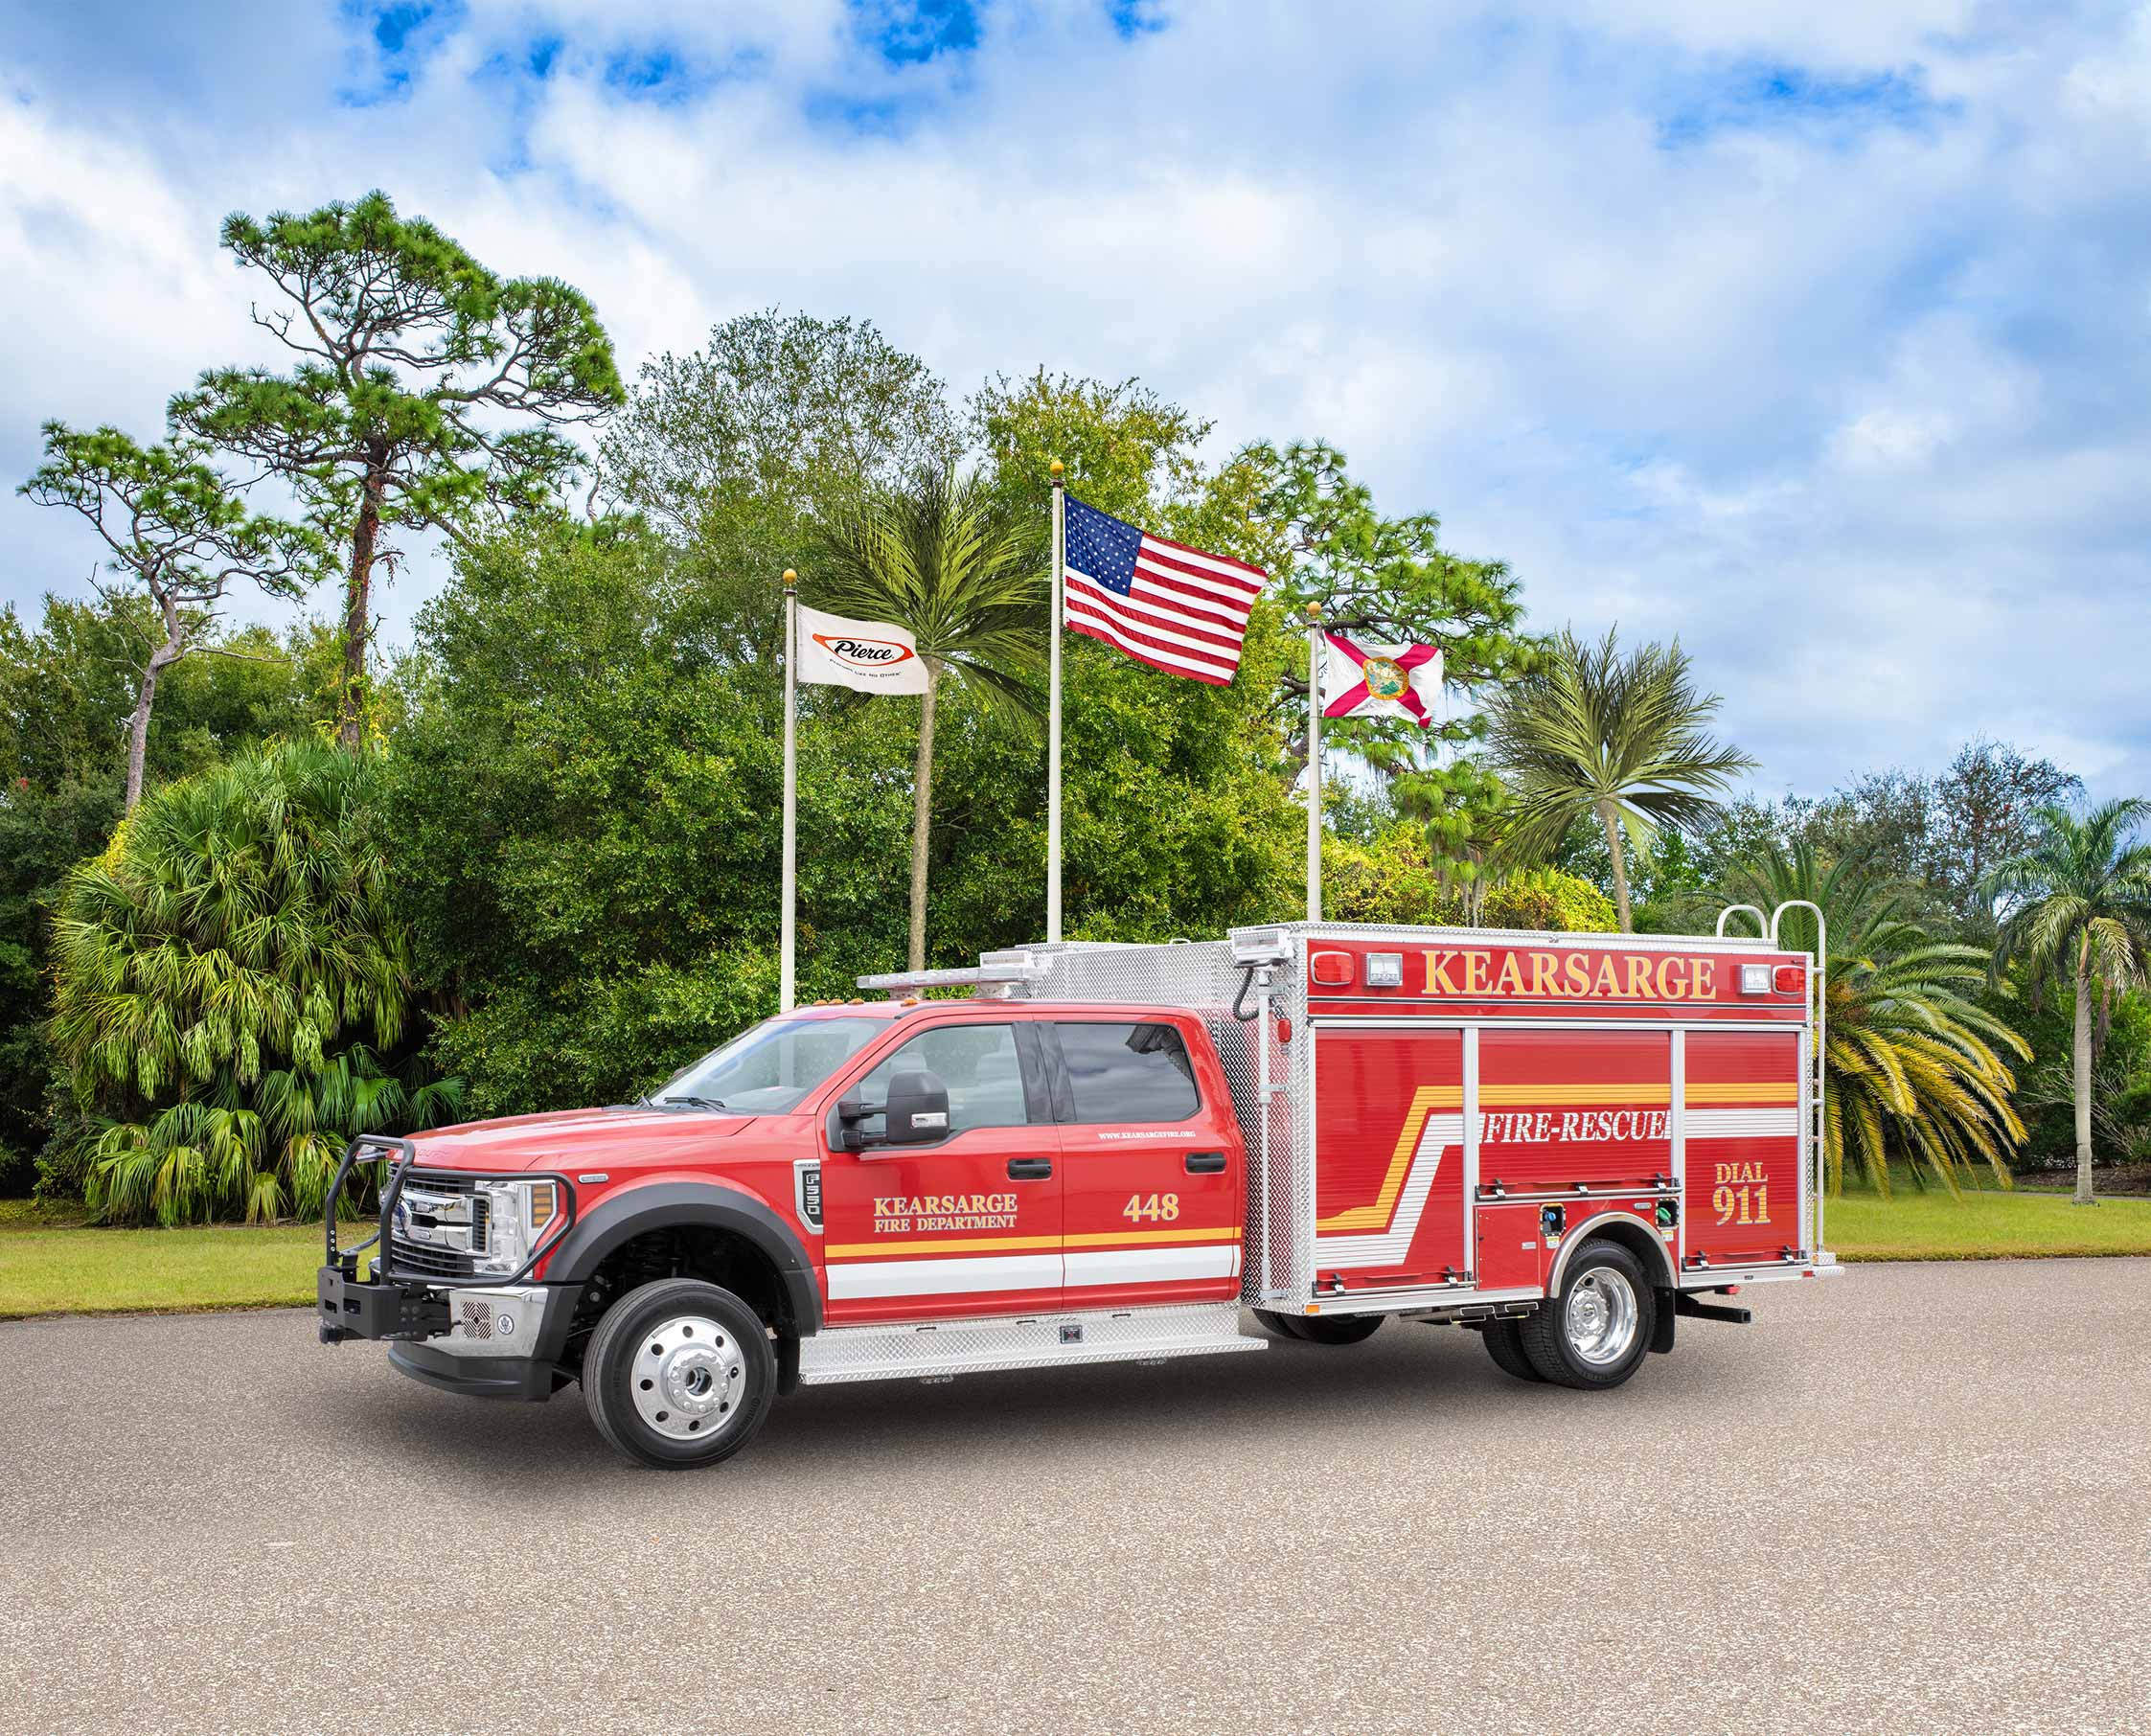 Kearsarge Fire Department - Rescue